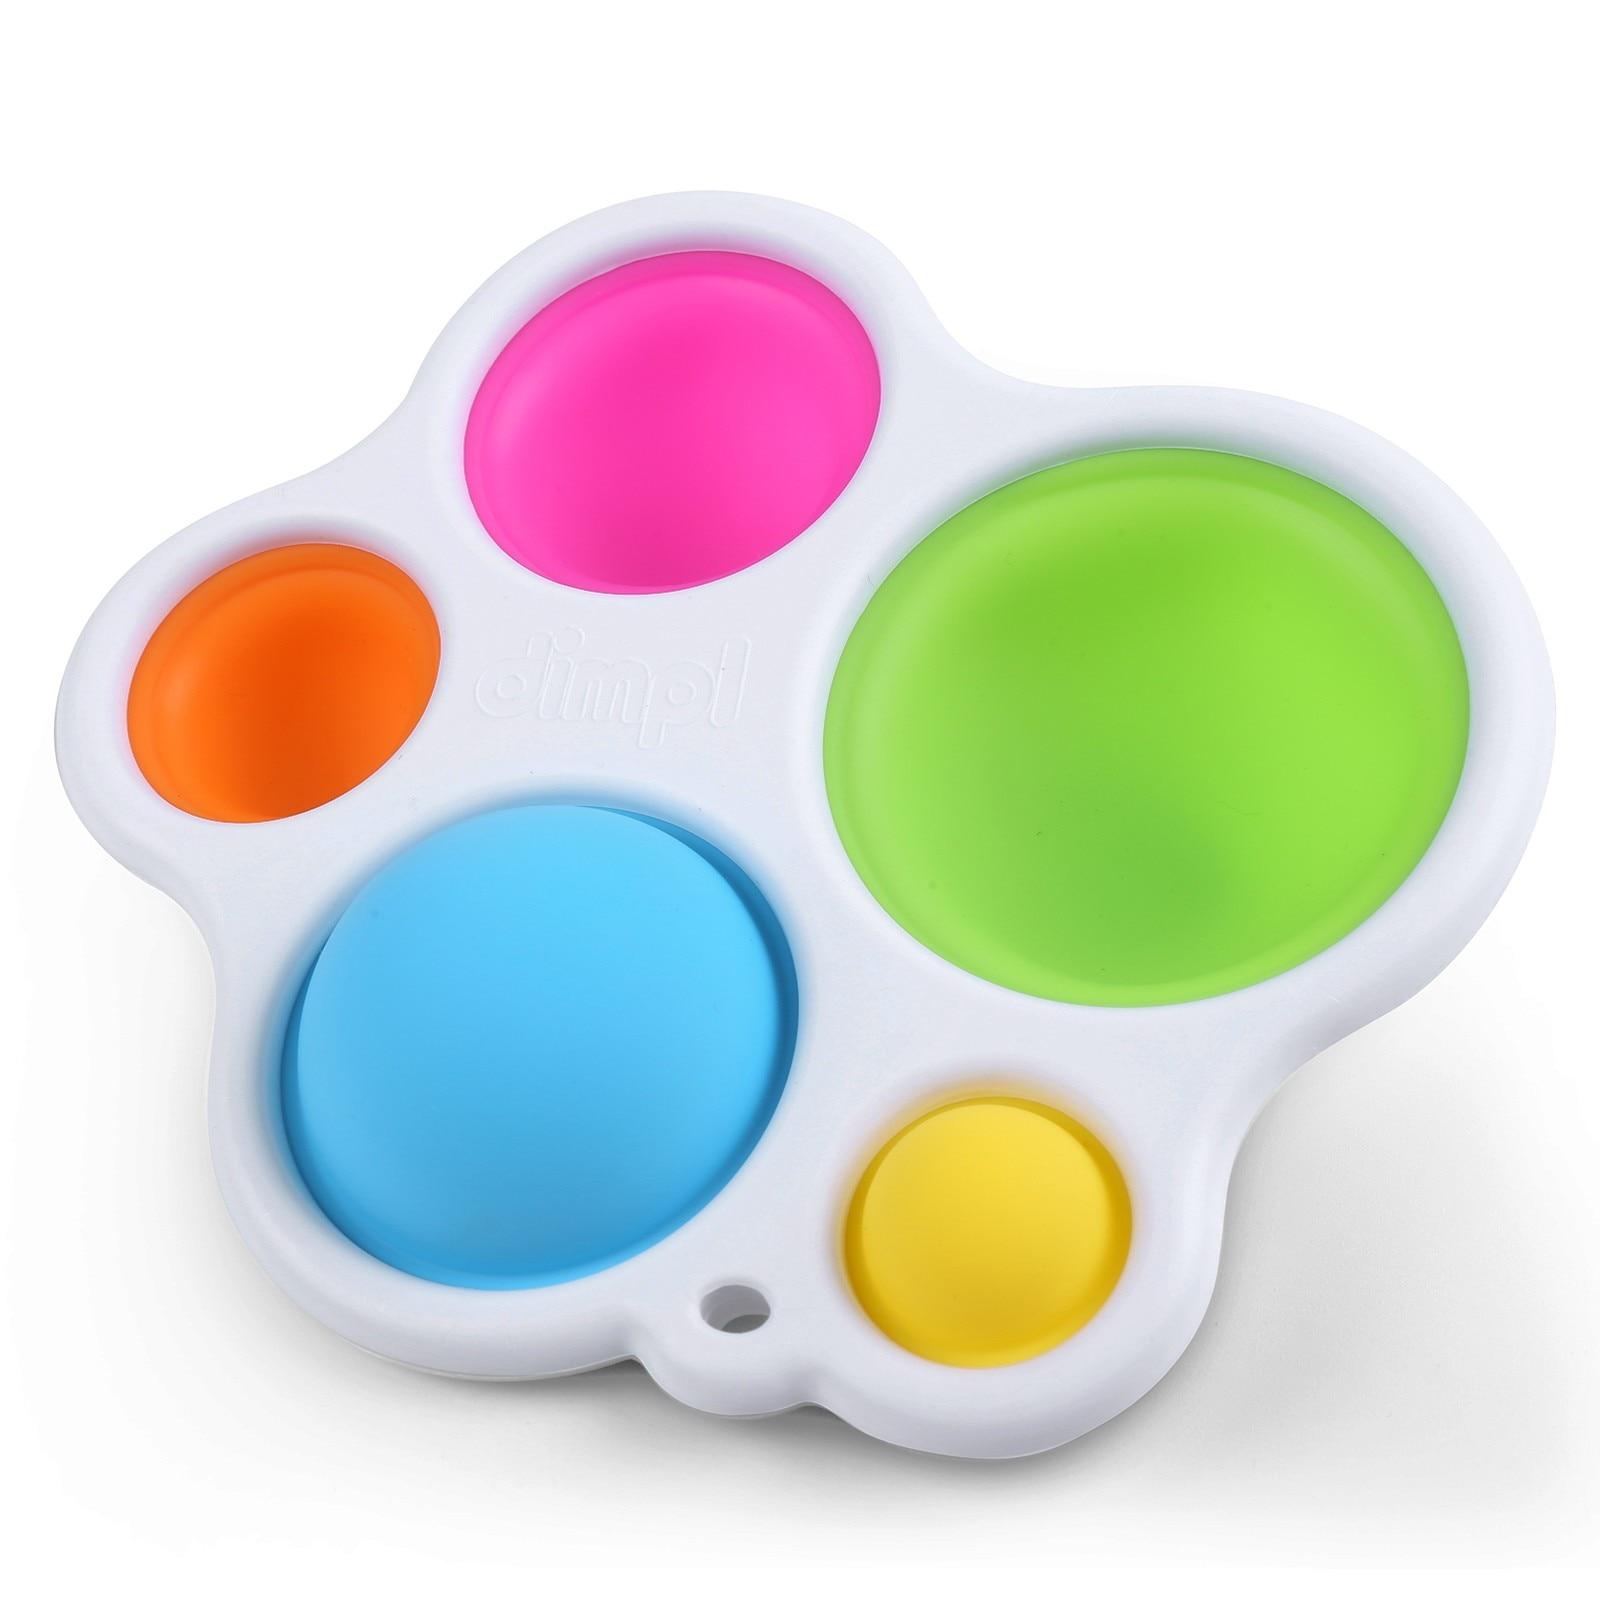 Adult Toys Fidget Rainbow Bubble-Sensory Pop-It Push-Pops Needs Anti-Stress Squishy Colorful img2